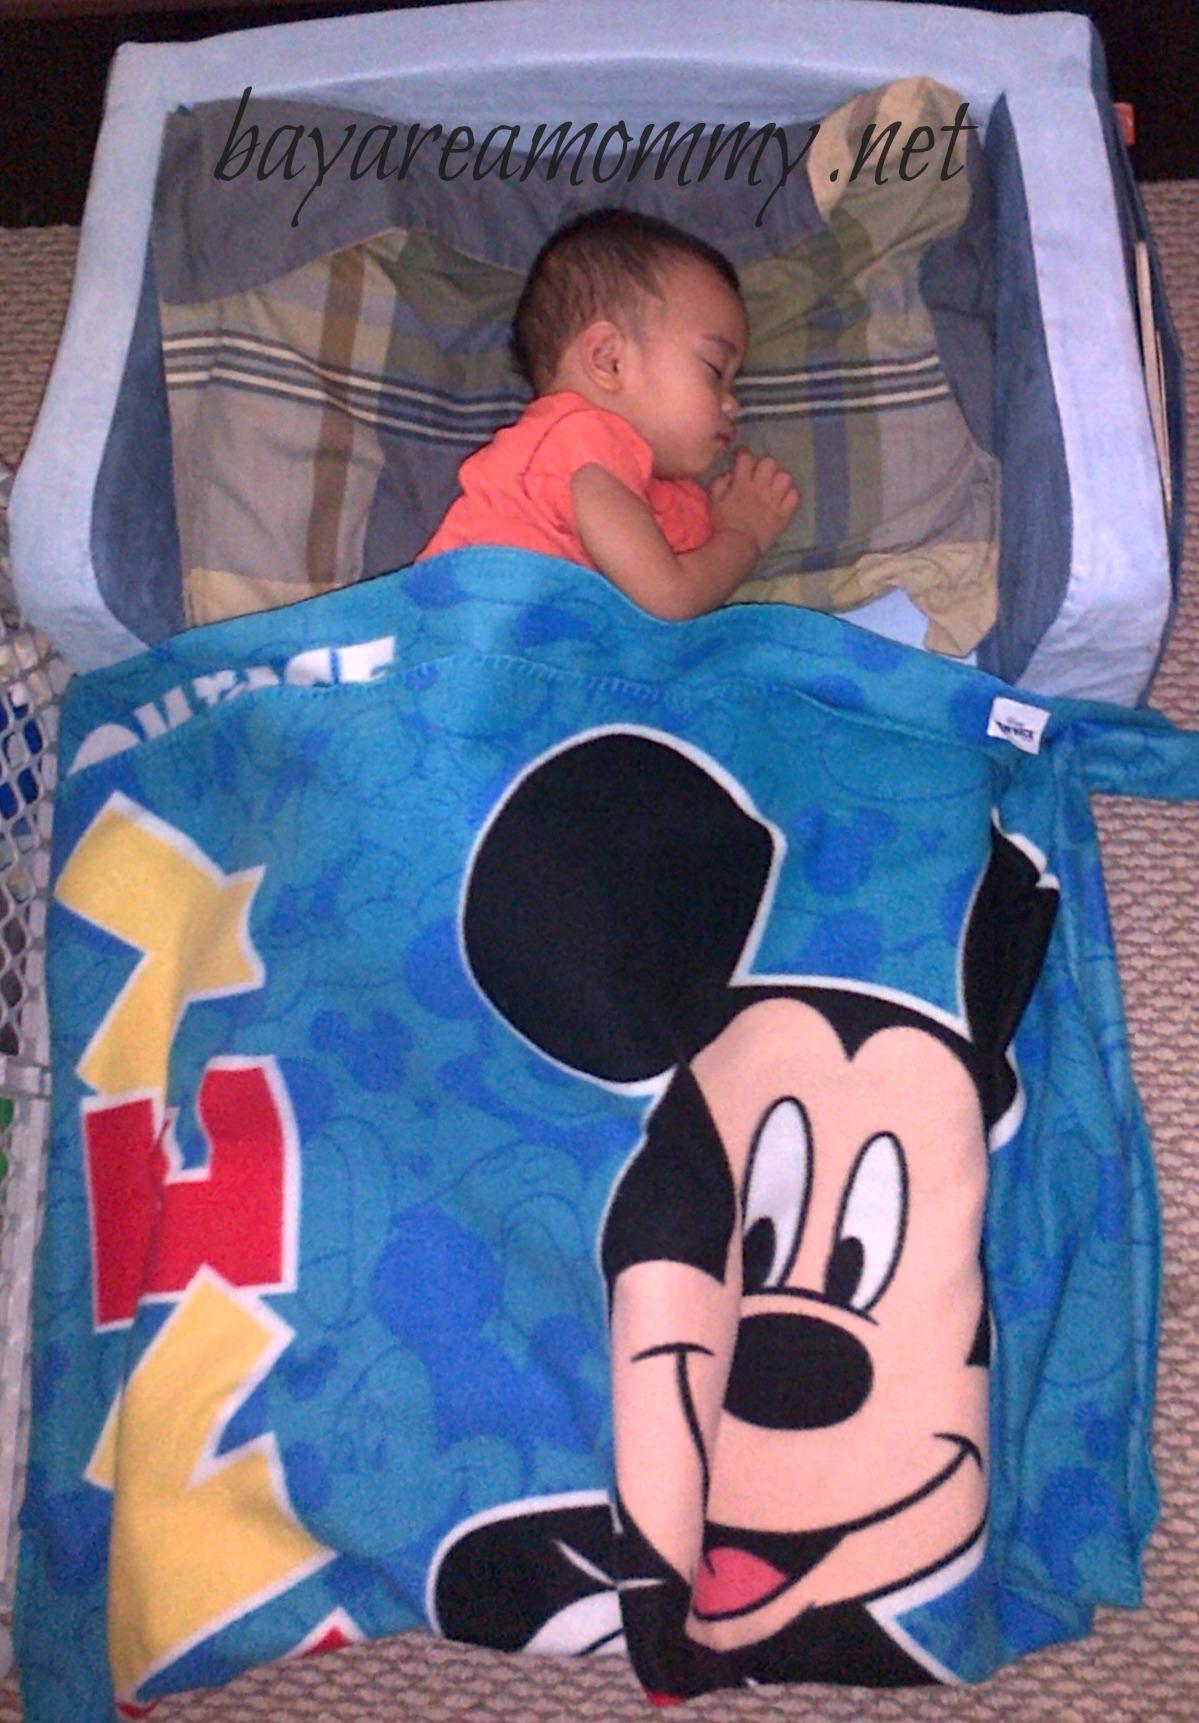 Pkolino Lil Sofa Sleeper on Bay Area Mommy